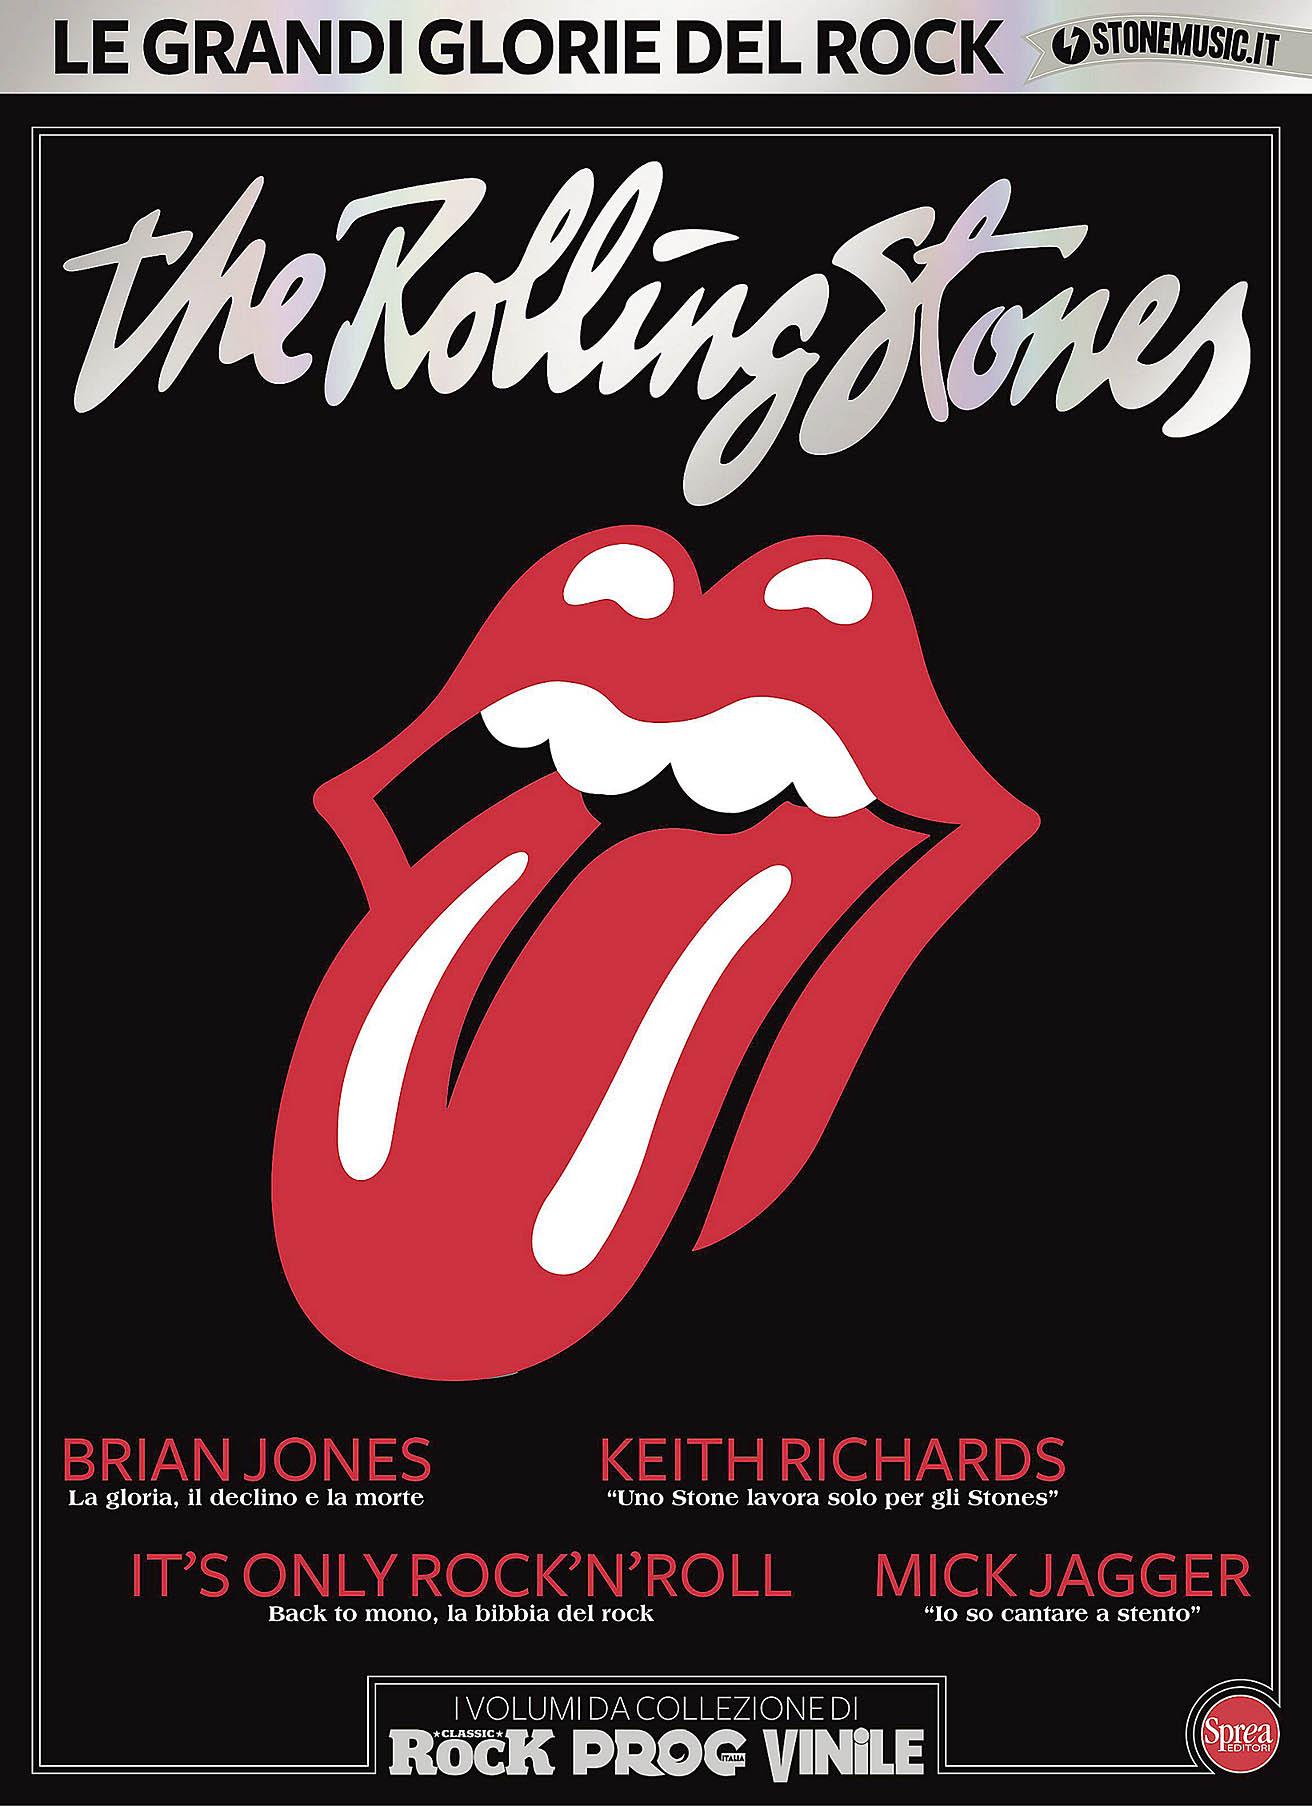 Classic Rock Italy Sp 2021 Rolling Stones.jpg